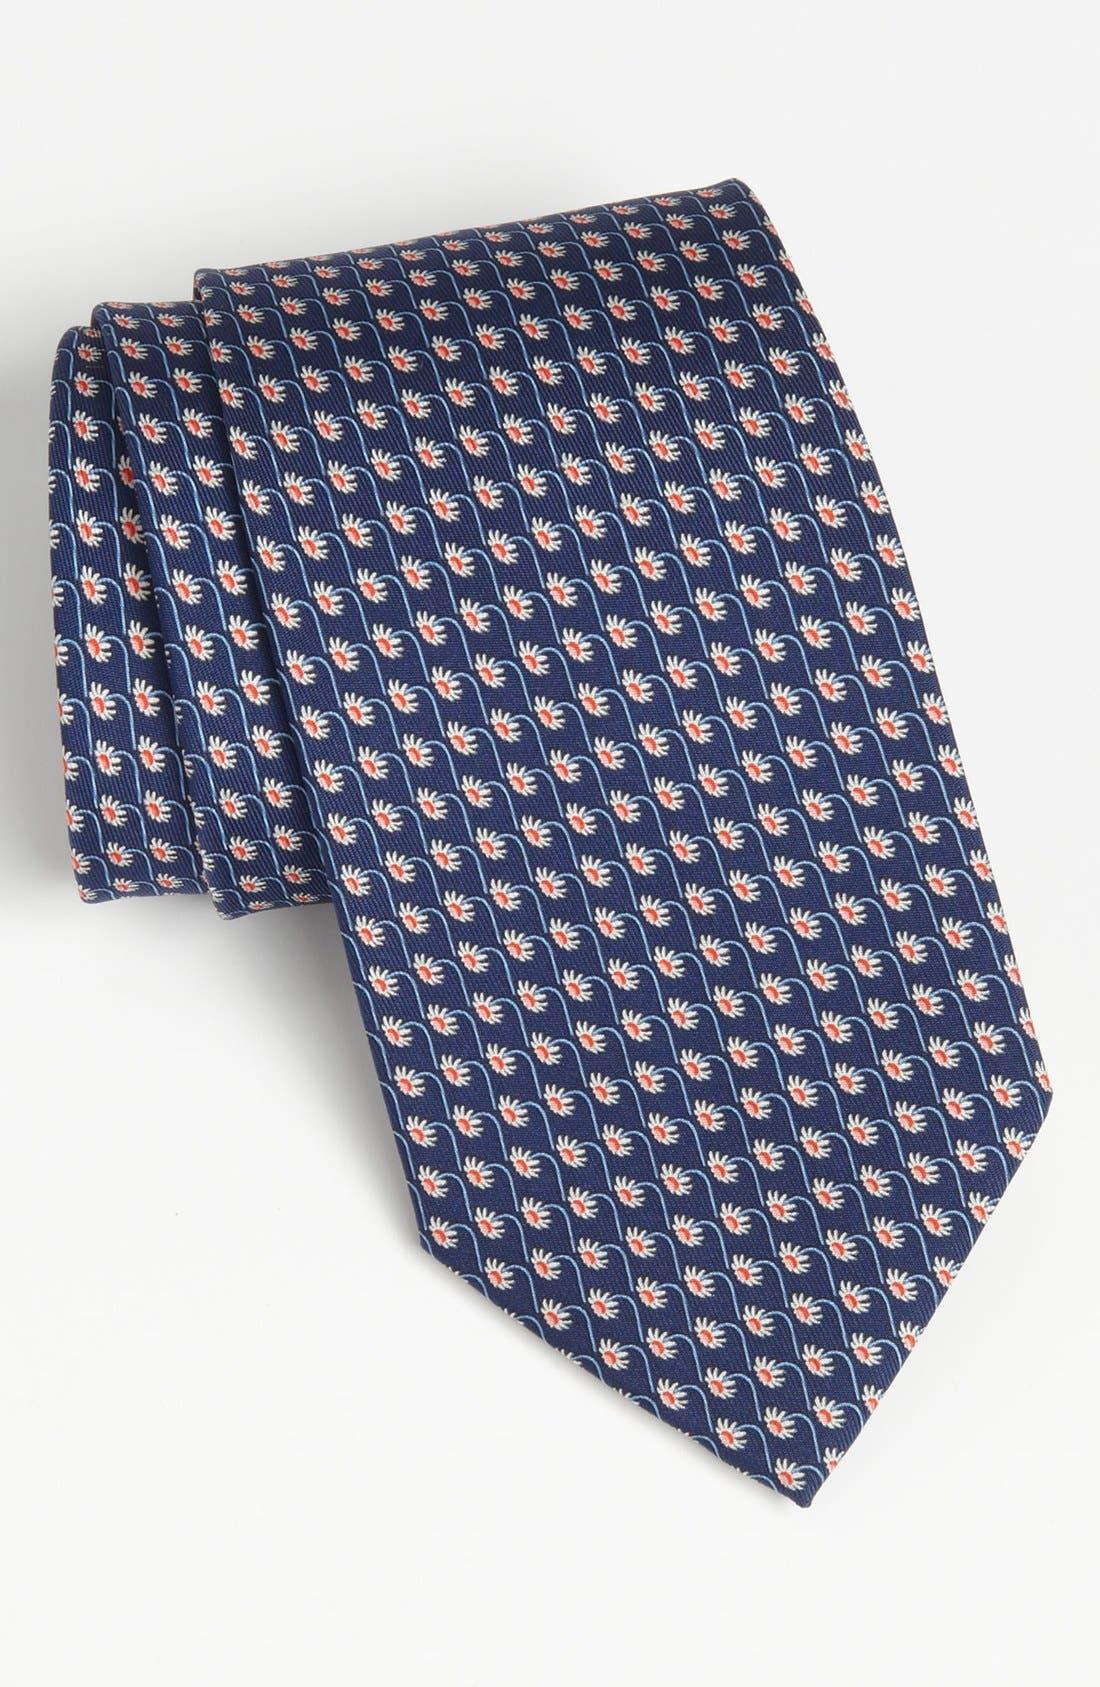 Alternate Image 1 Selected - Salvatore Ferragamo Floral Print Silk Tie